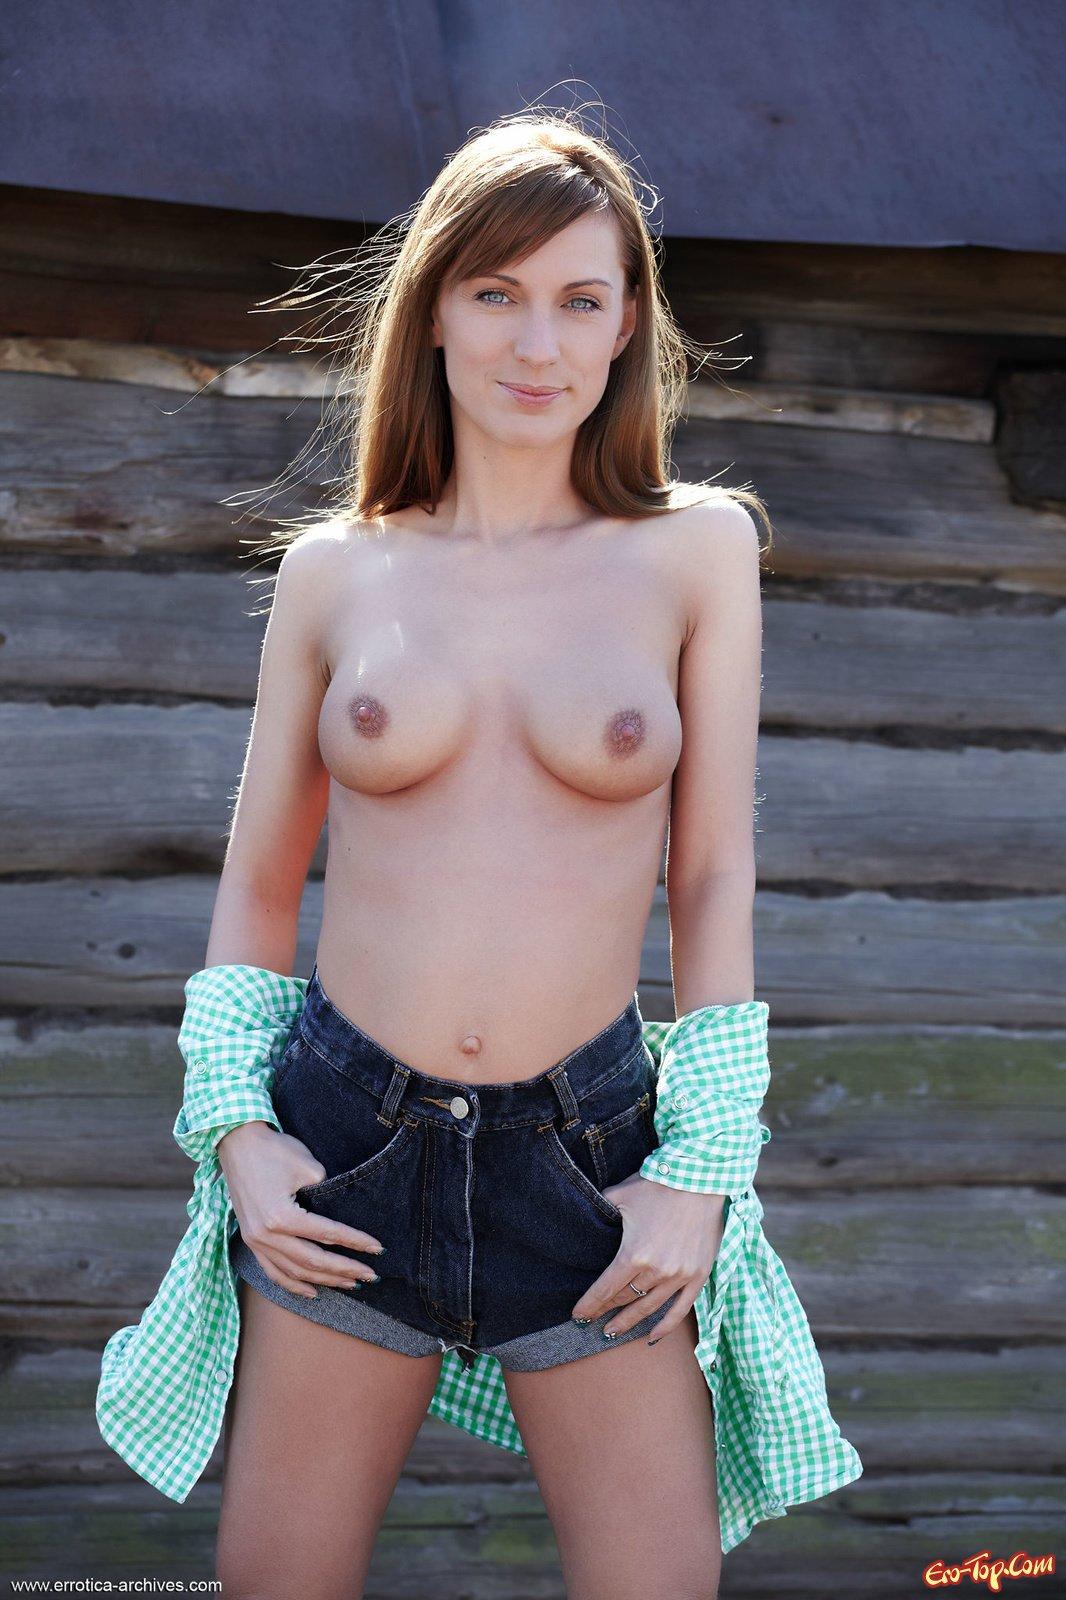 Девушка сняла шорты показав киску в деревне